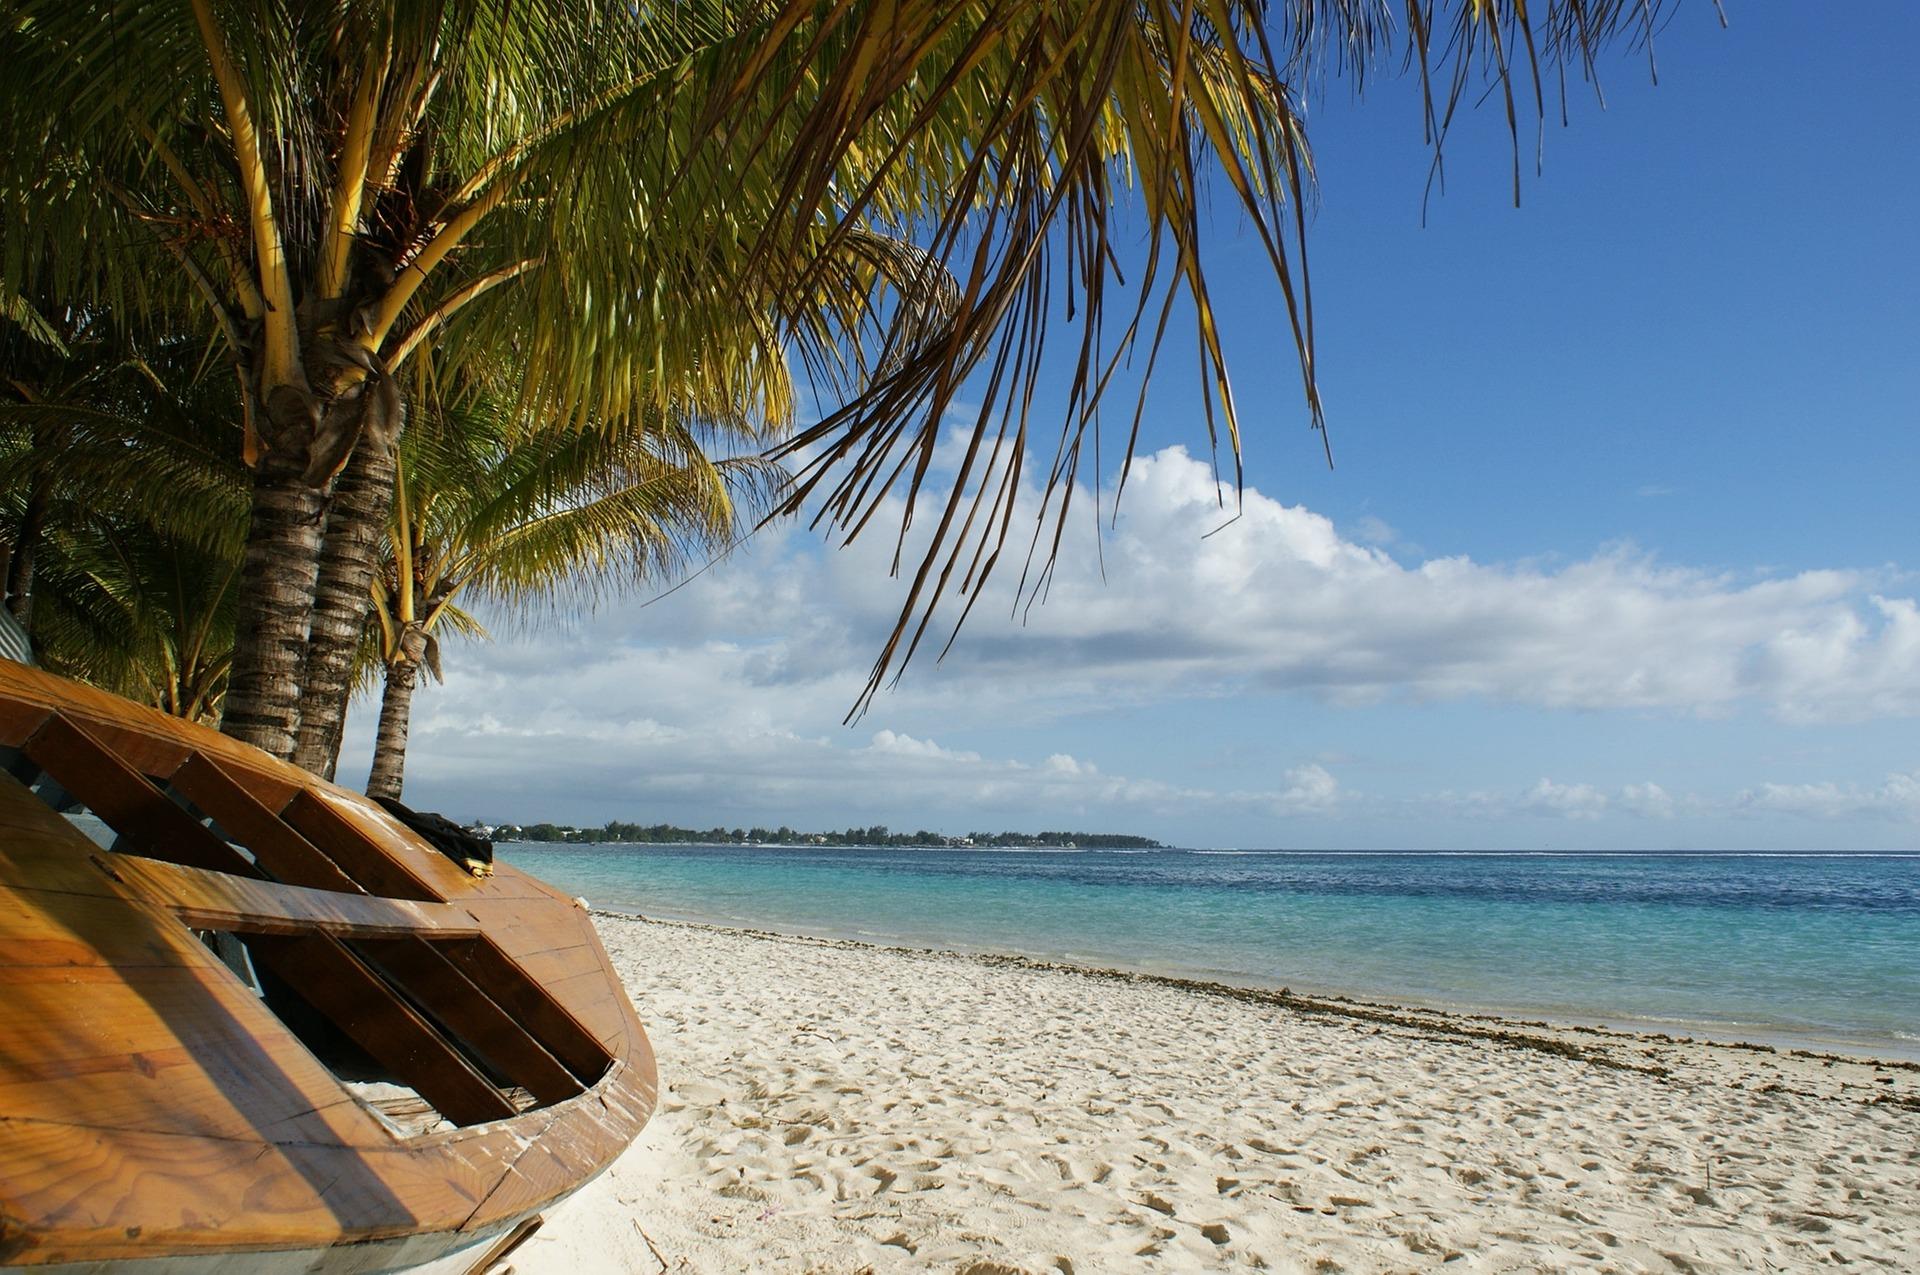 Mauritius-Beach-Boat